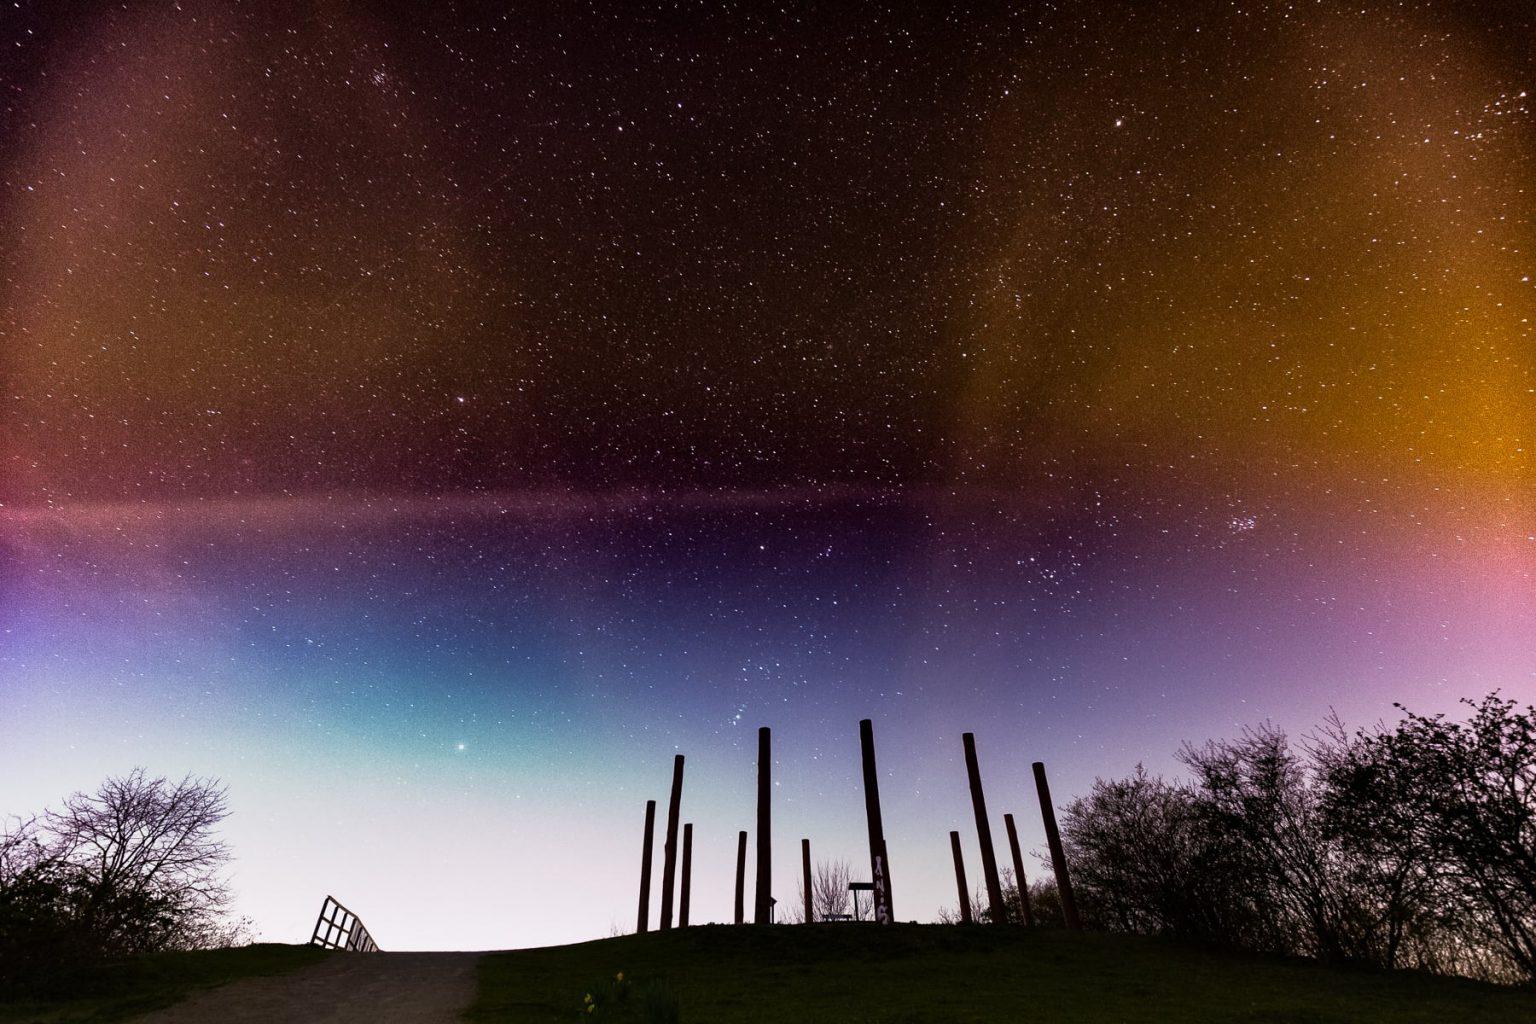 Sternenhimmel über den Totempfählen im Duisburger Landschaftspark Nord